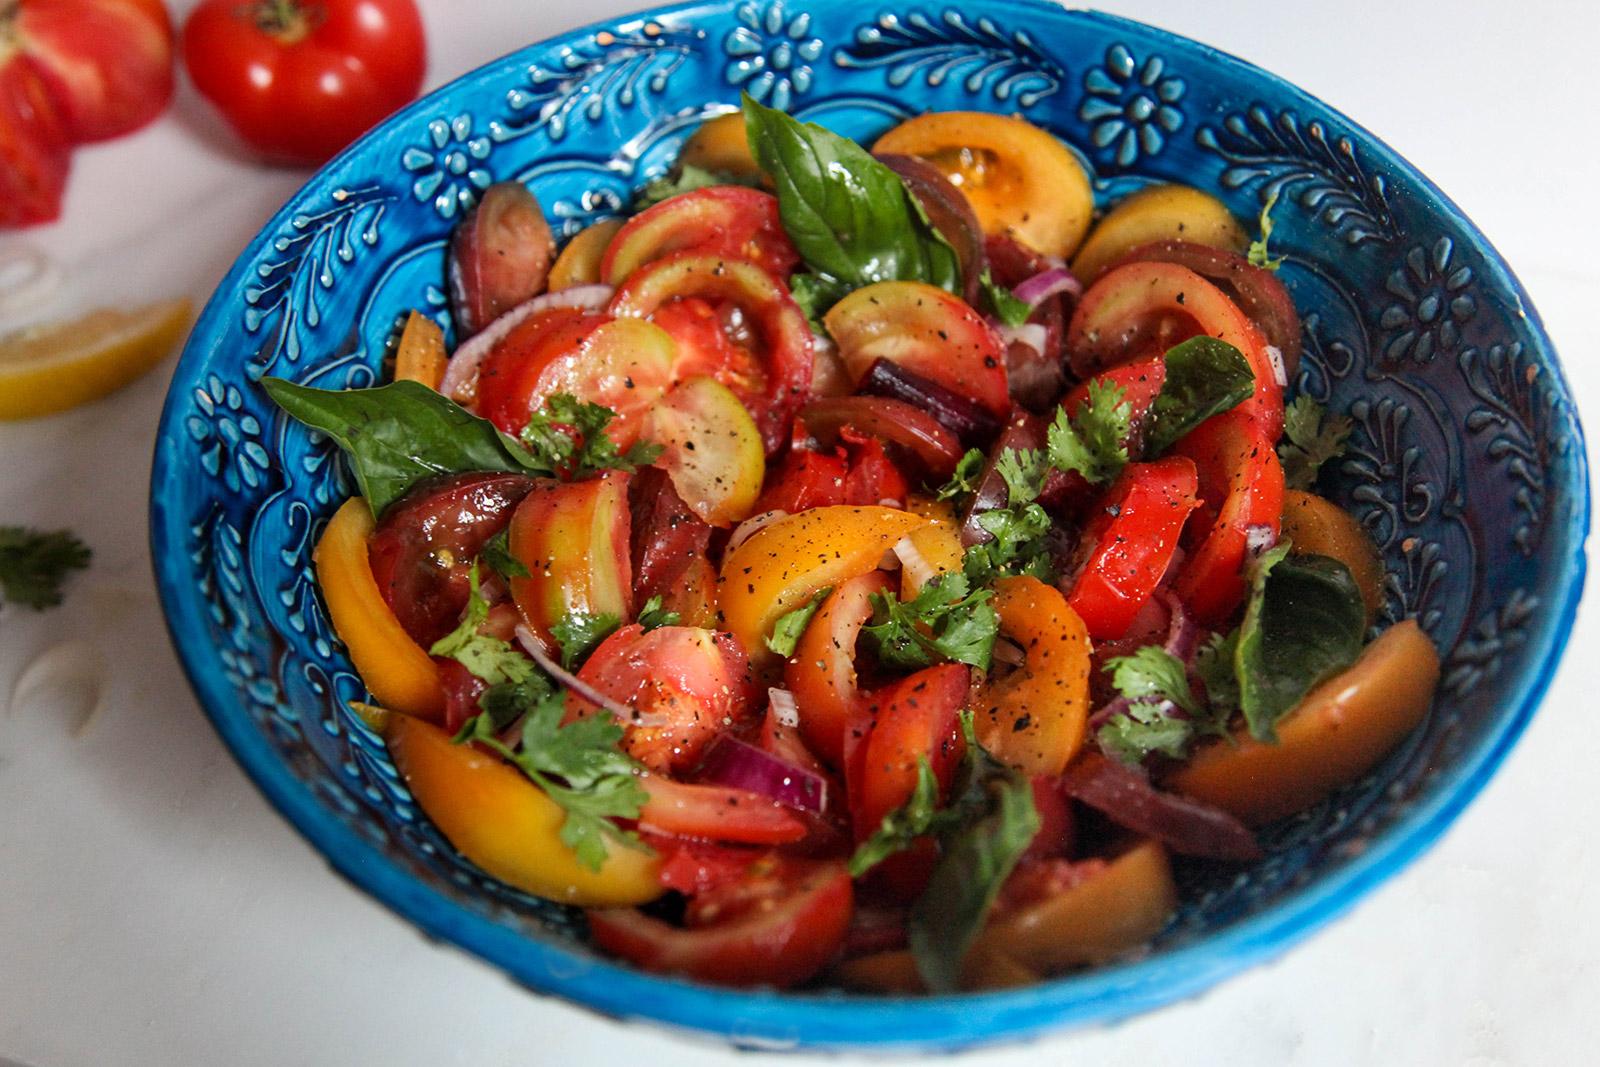 Simple Heirloom Tomato Salad, Portuguese-inspired